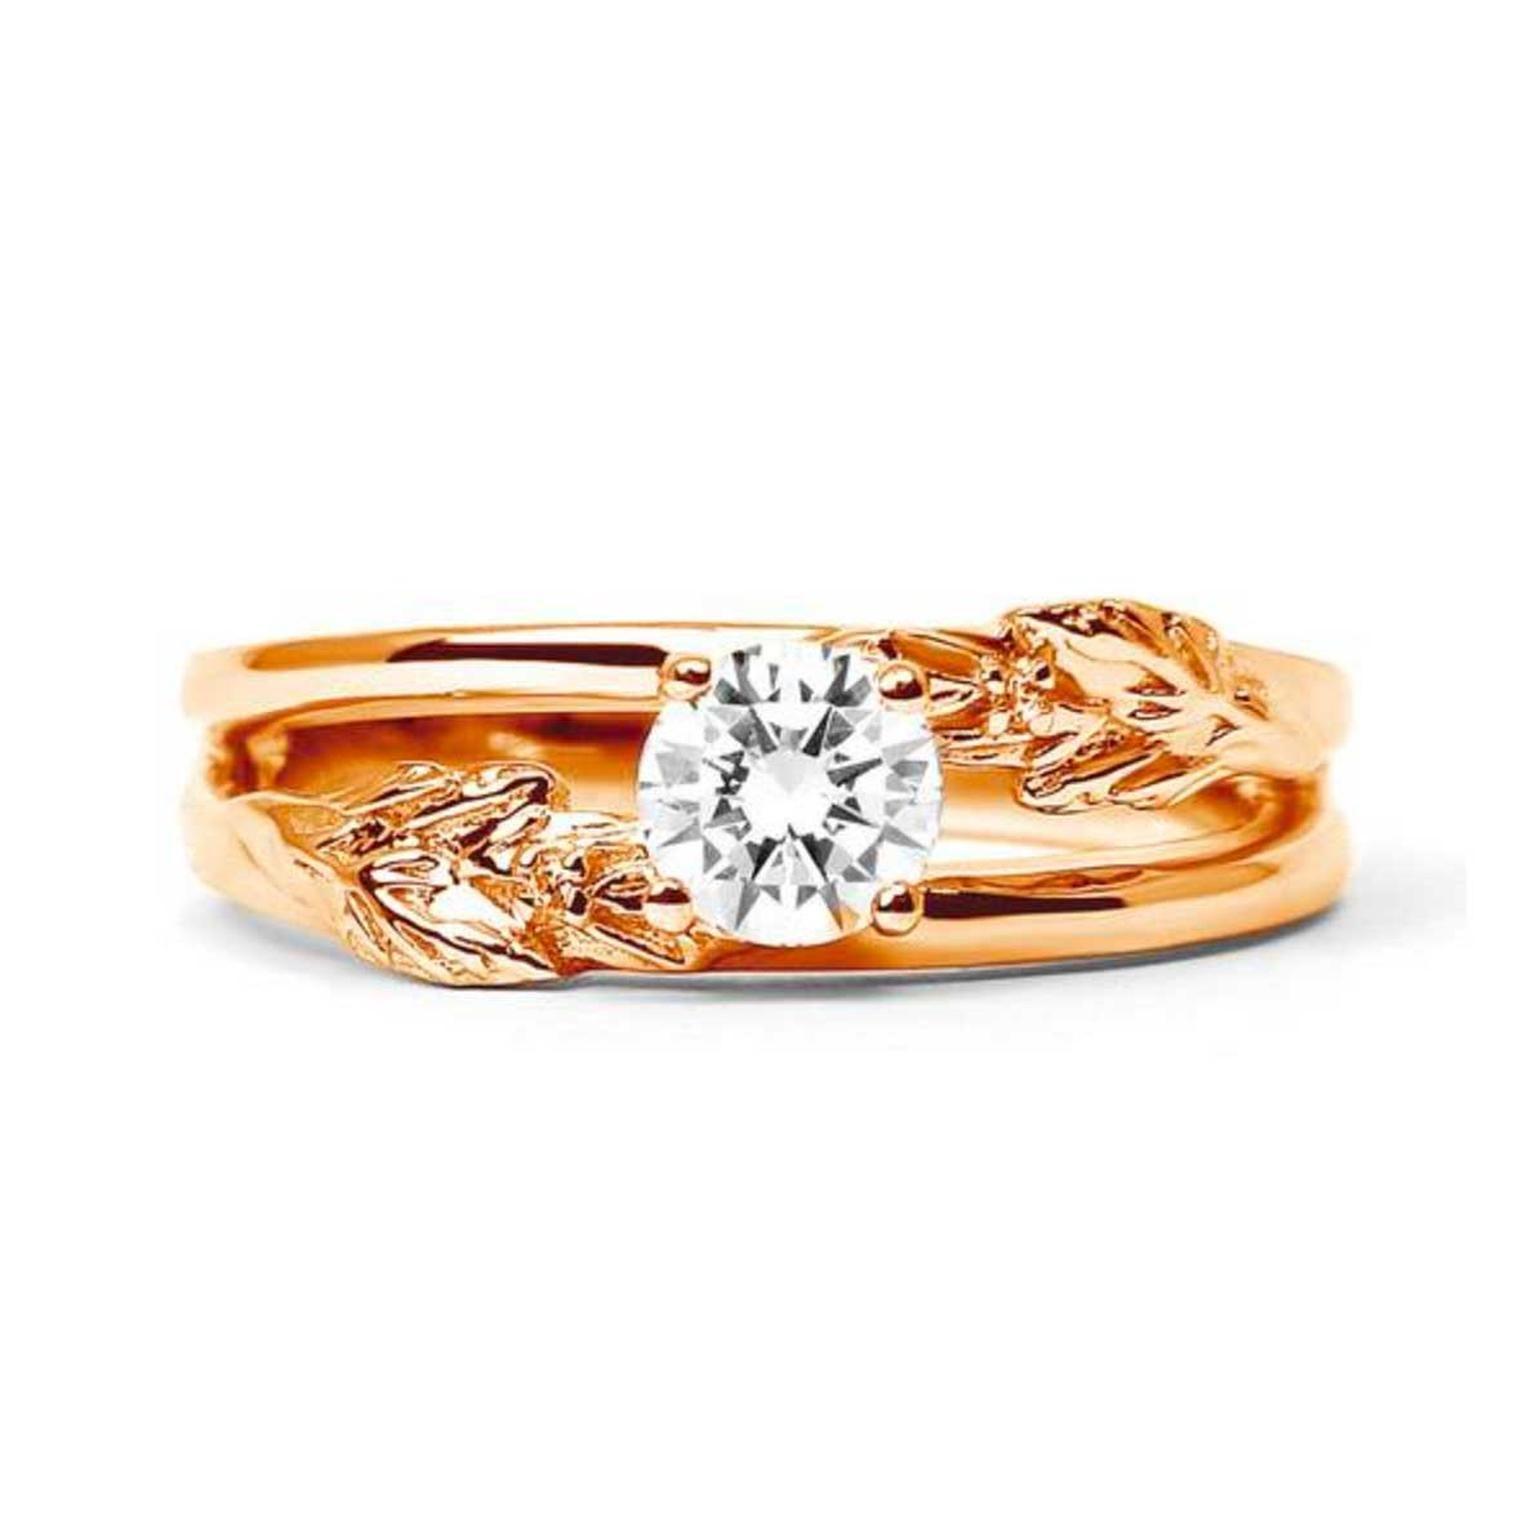 Royal Oak Engagement Ring